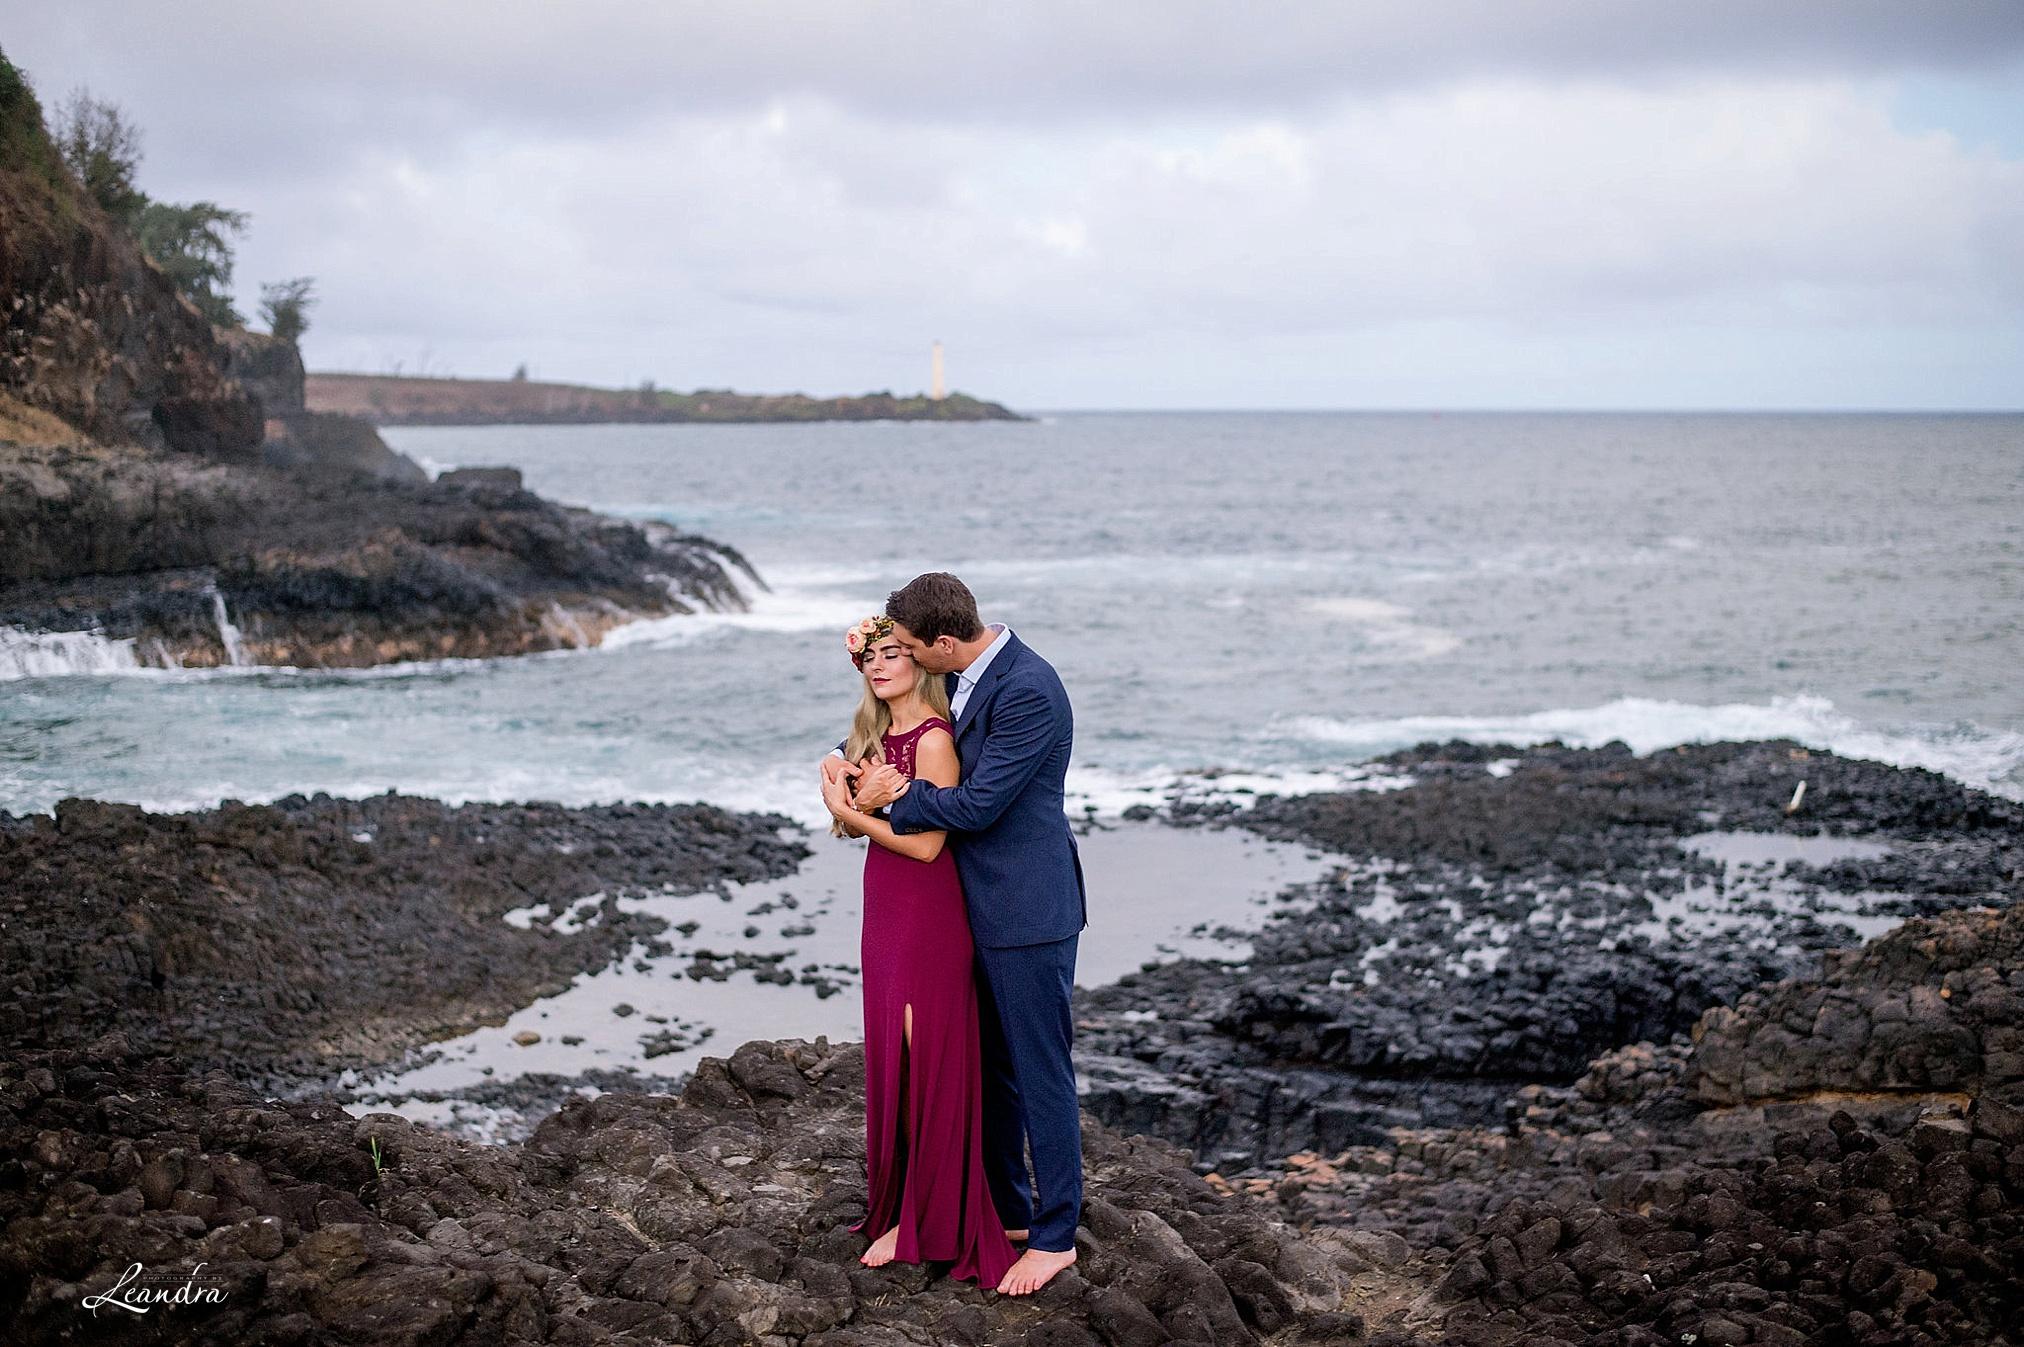 Kauai Destination Wedding Photographer | Photography by Leandra